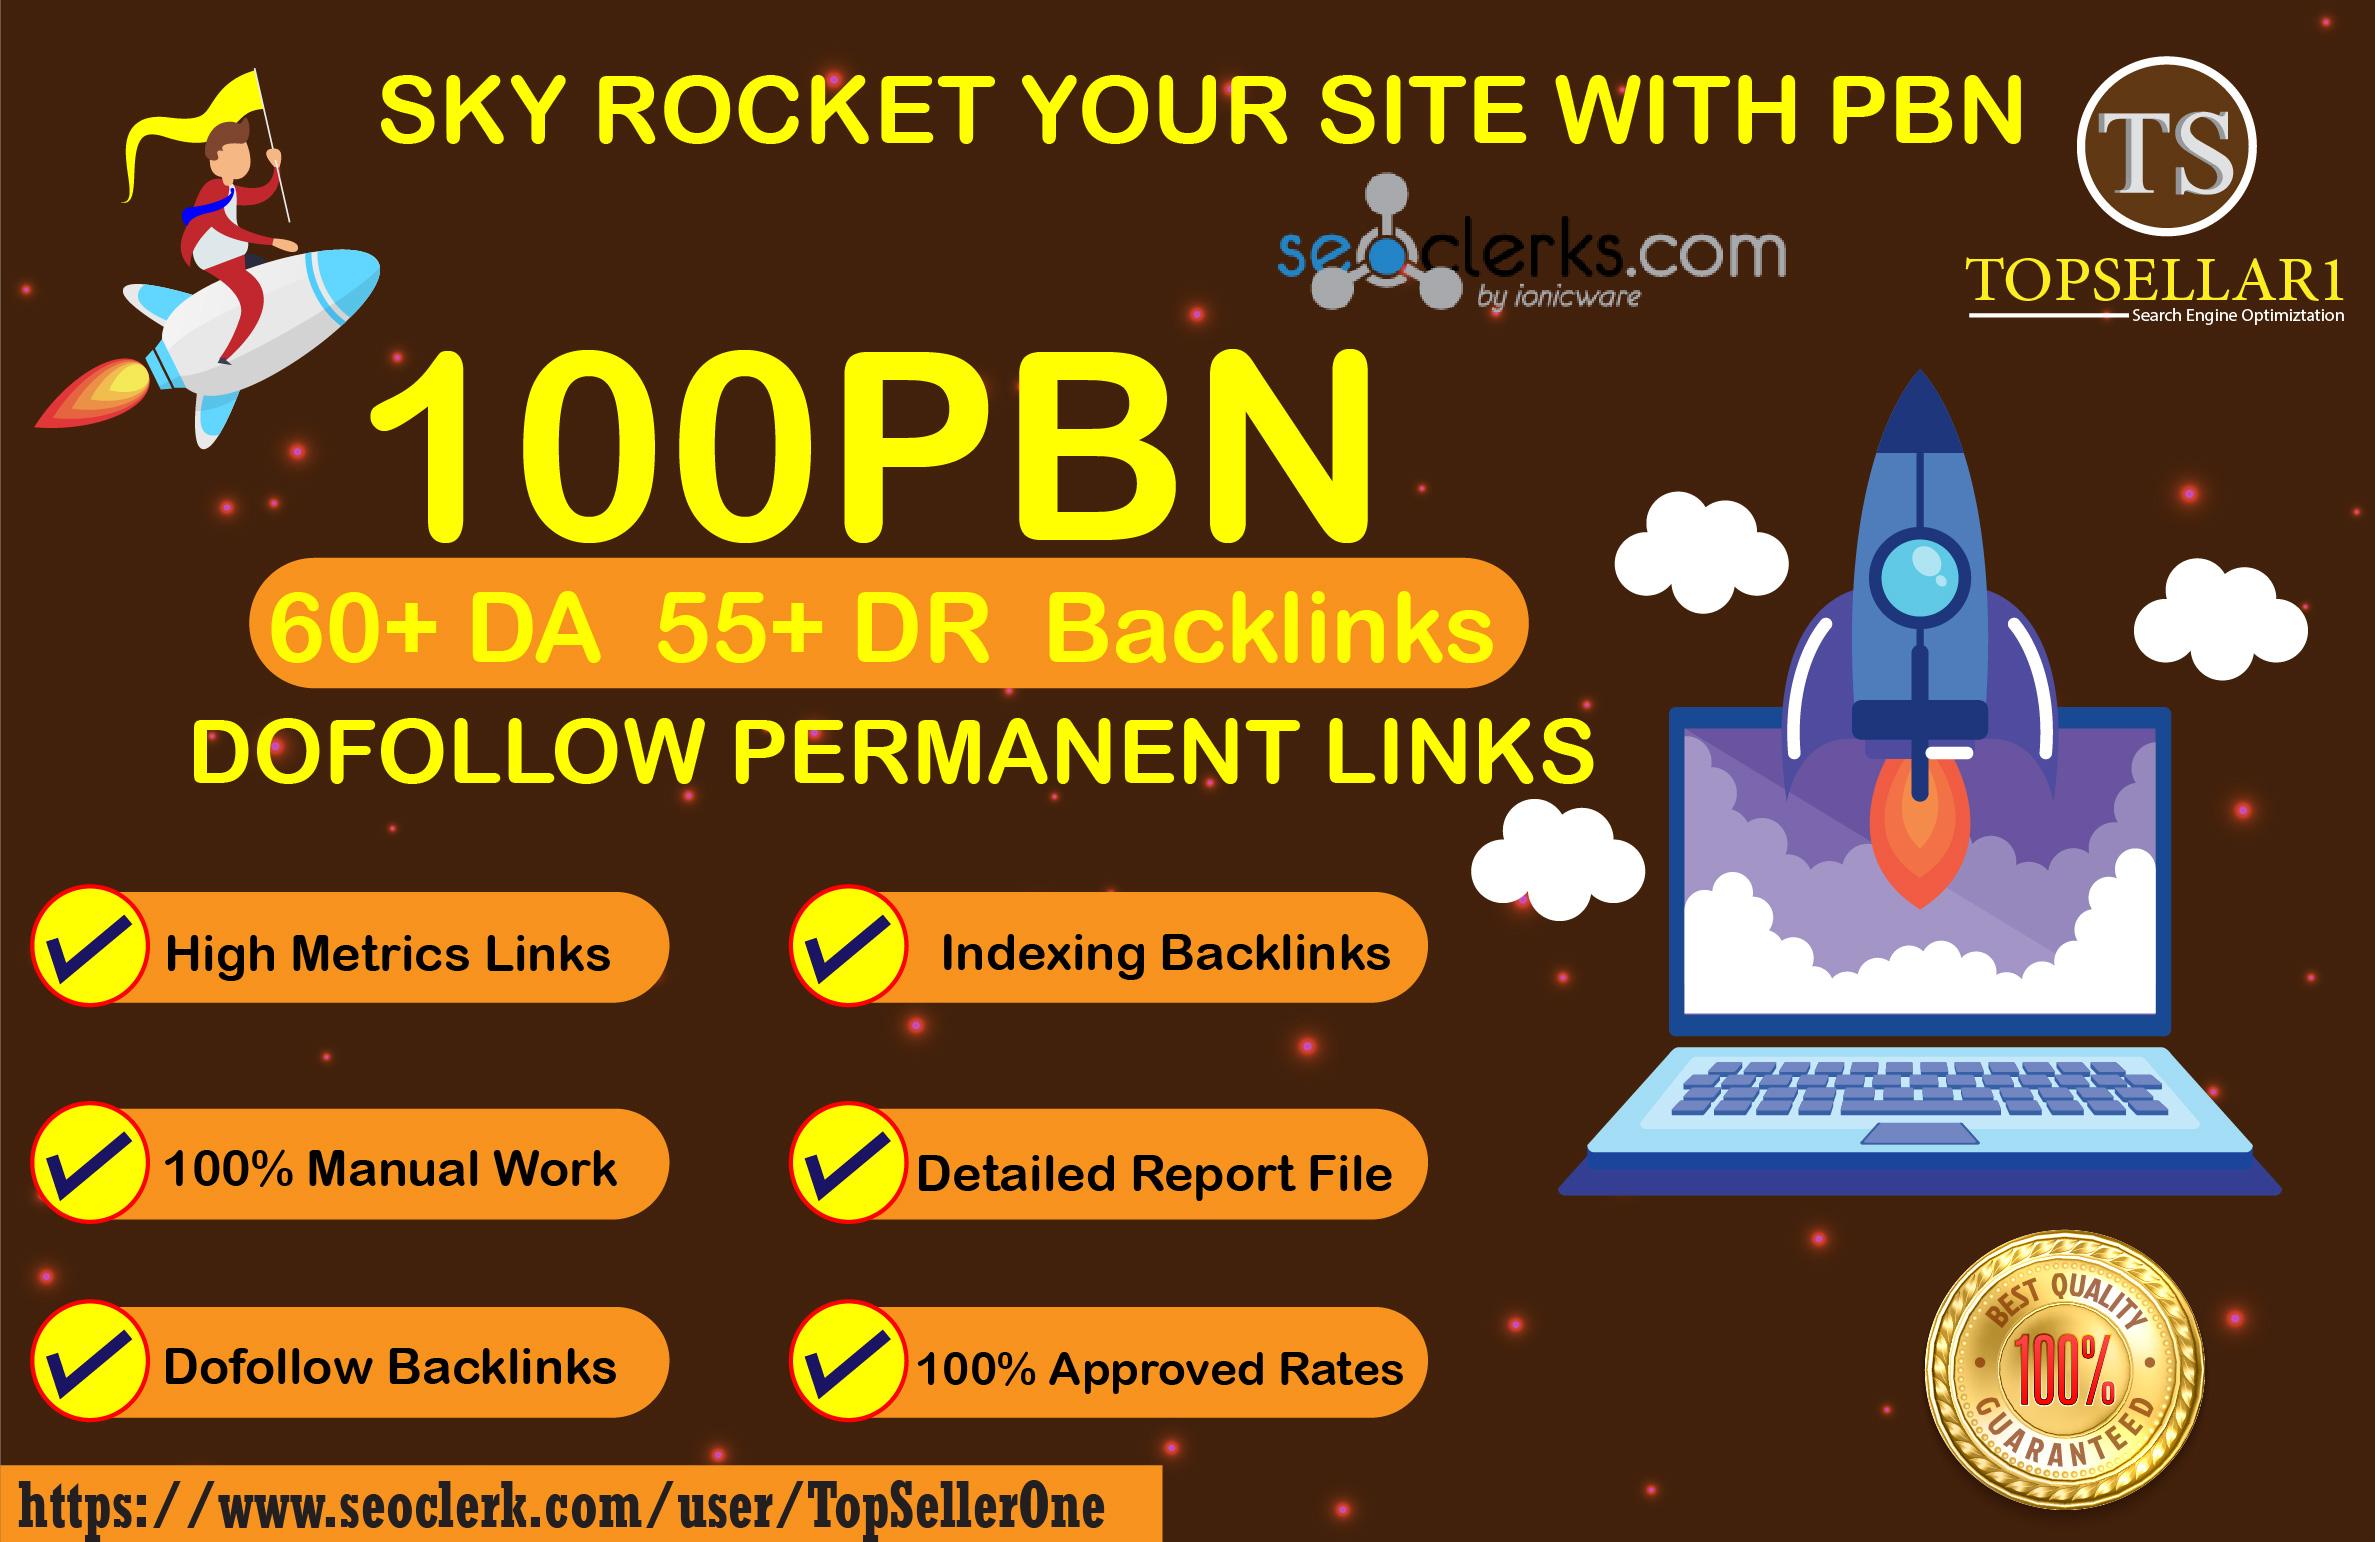 Give 100 PBN High Metrics Links 60+DA 50+DR Dofollow permanent Backlinks